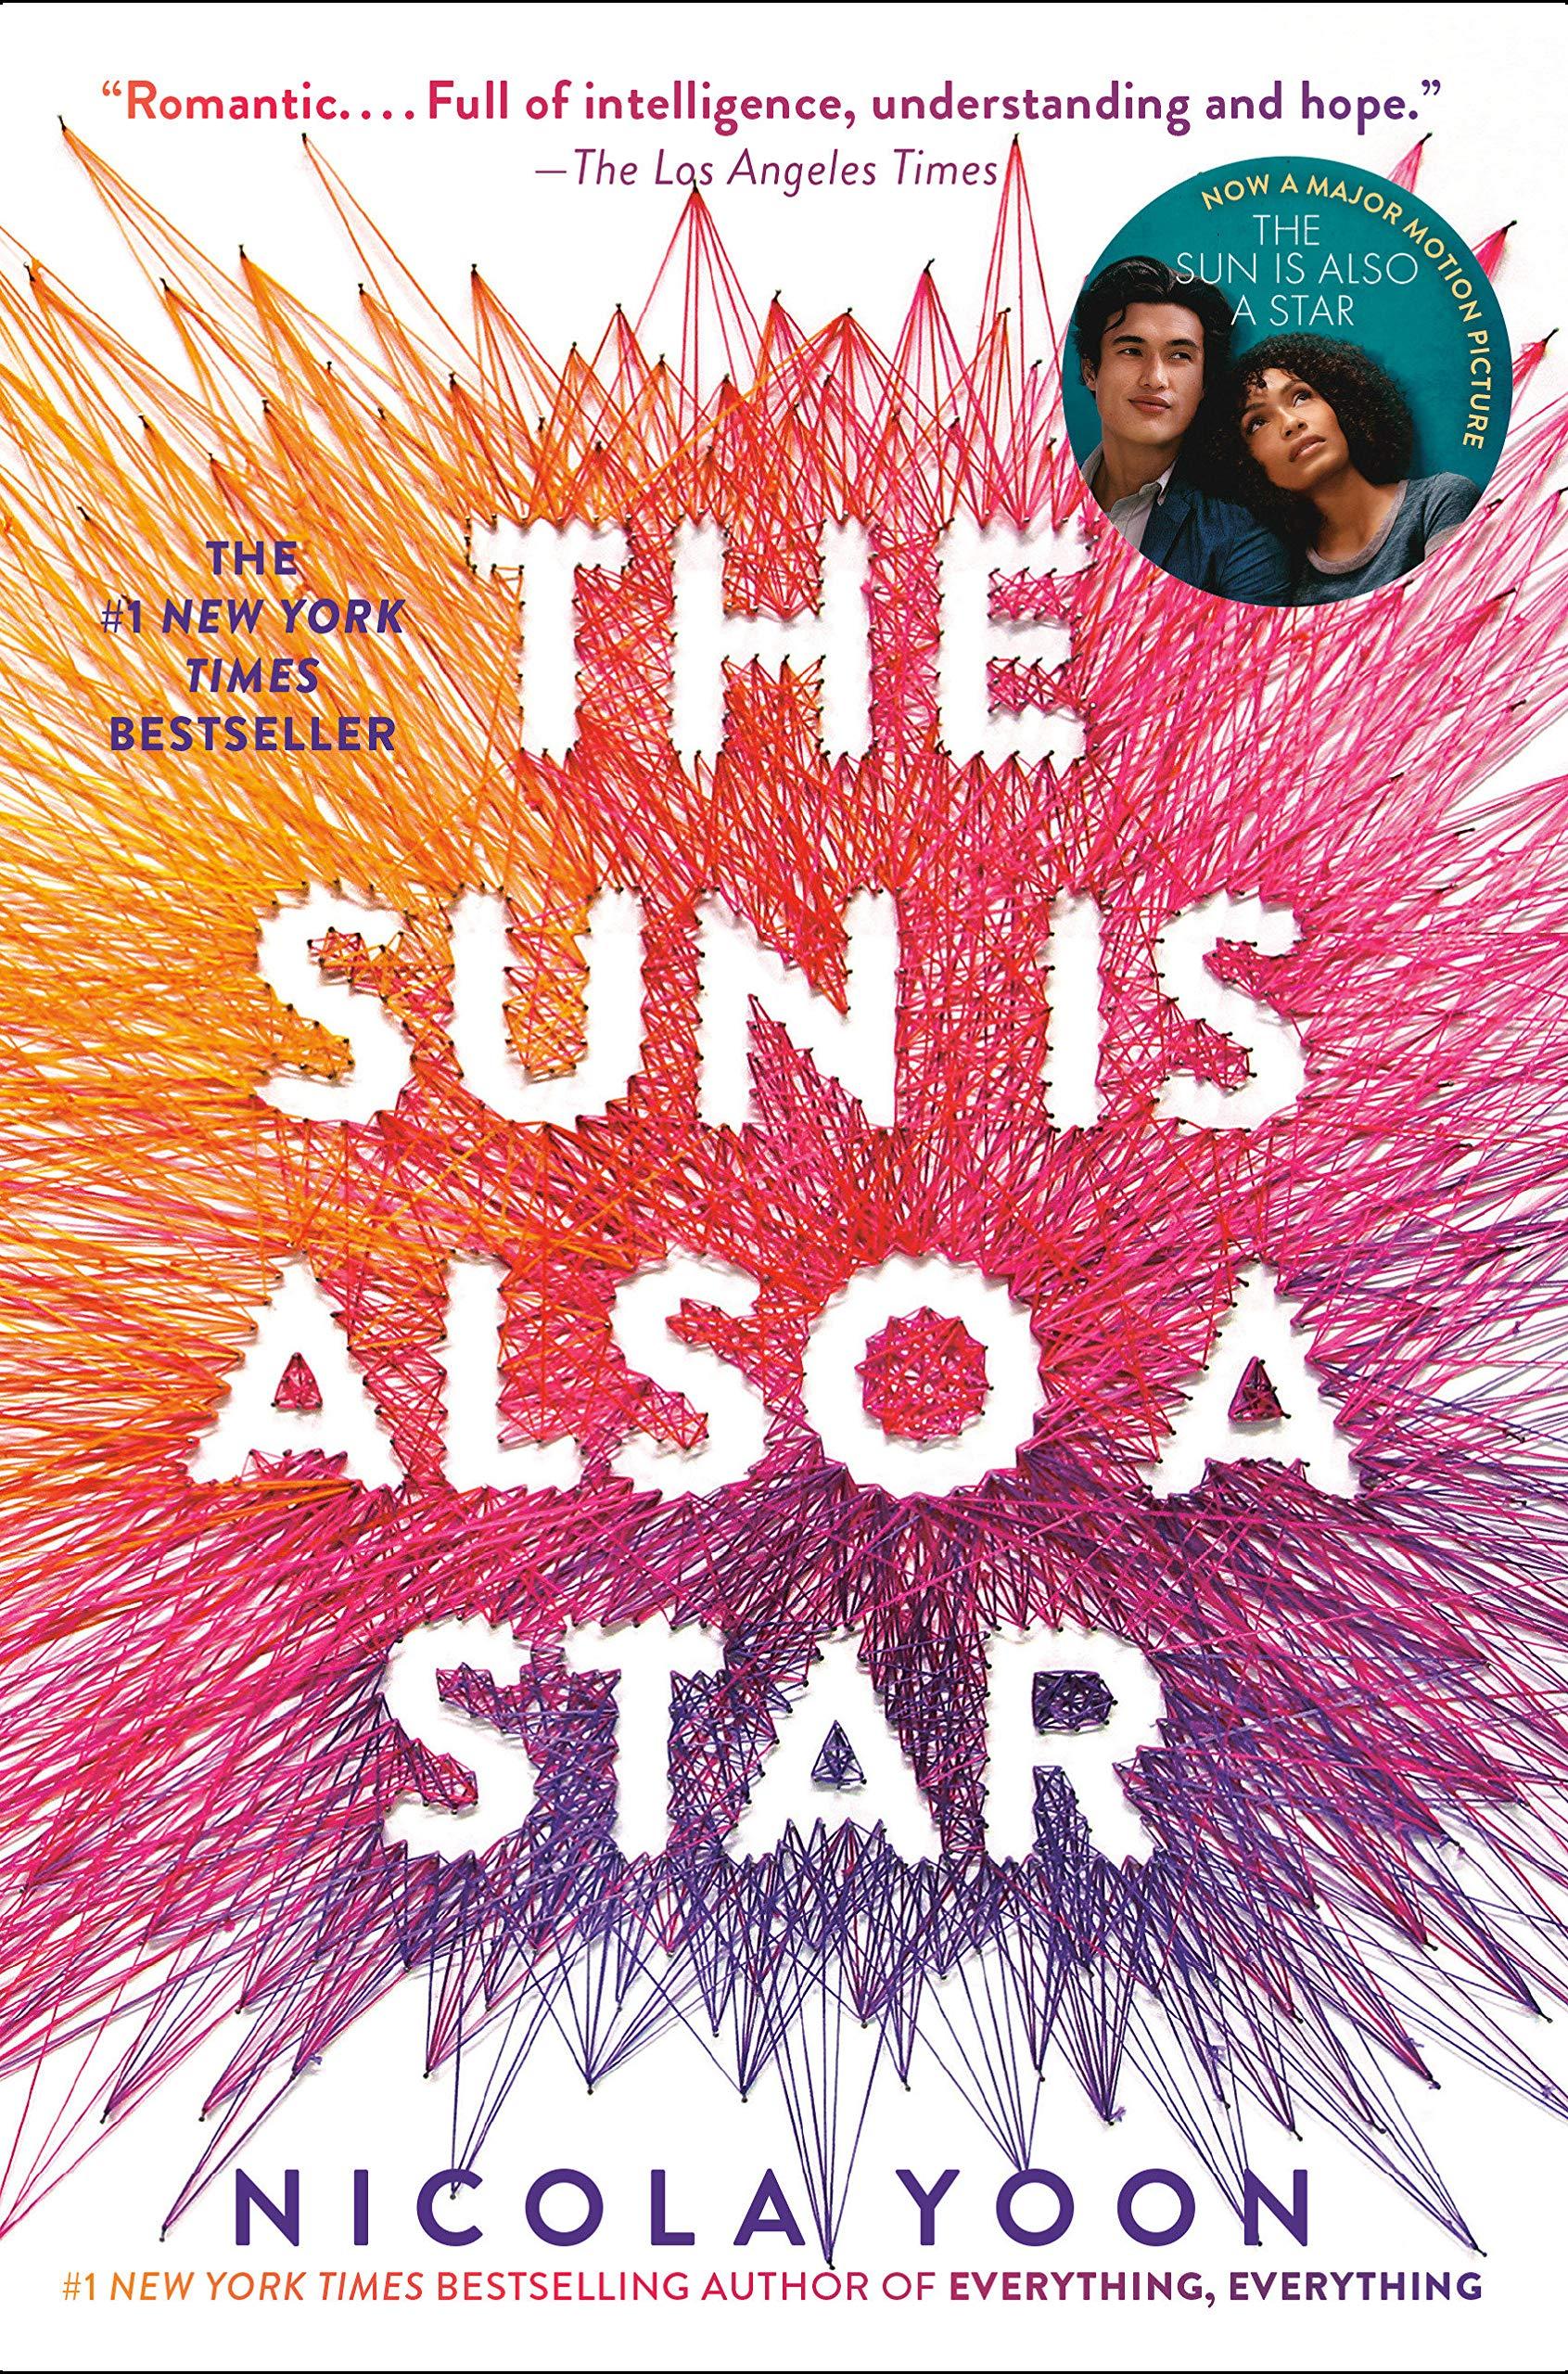 Amazon.com: The Sun Is Also a Star (Yoon, Nicola) (9780553496680): Yoon,  Nicola: Books